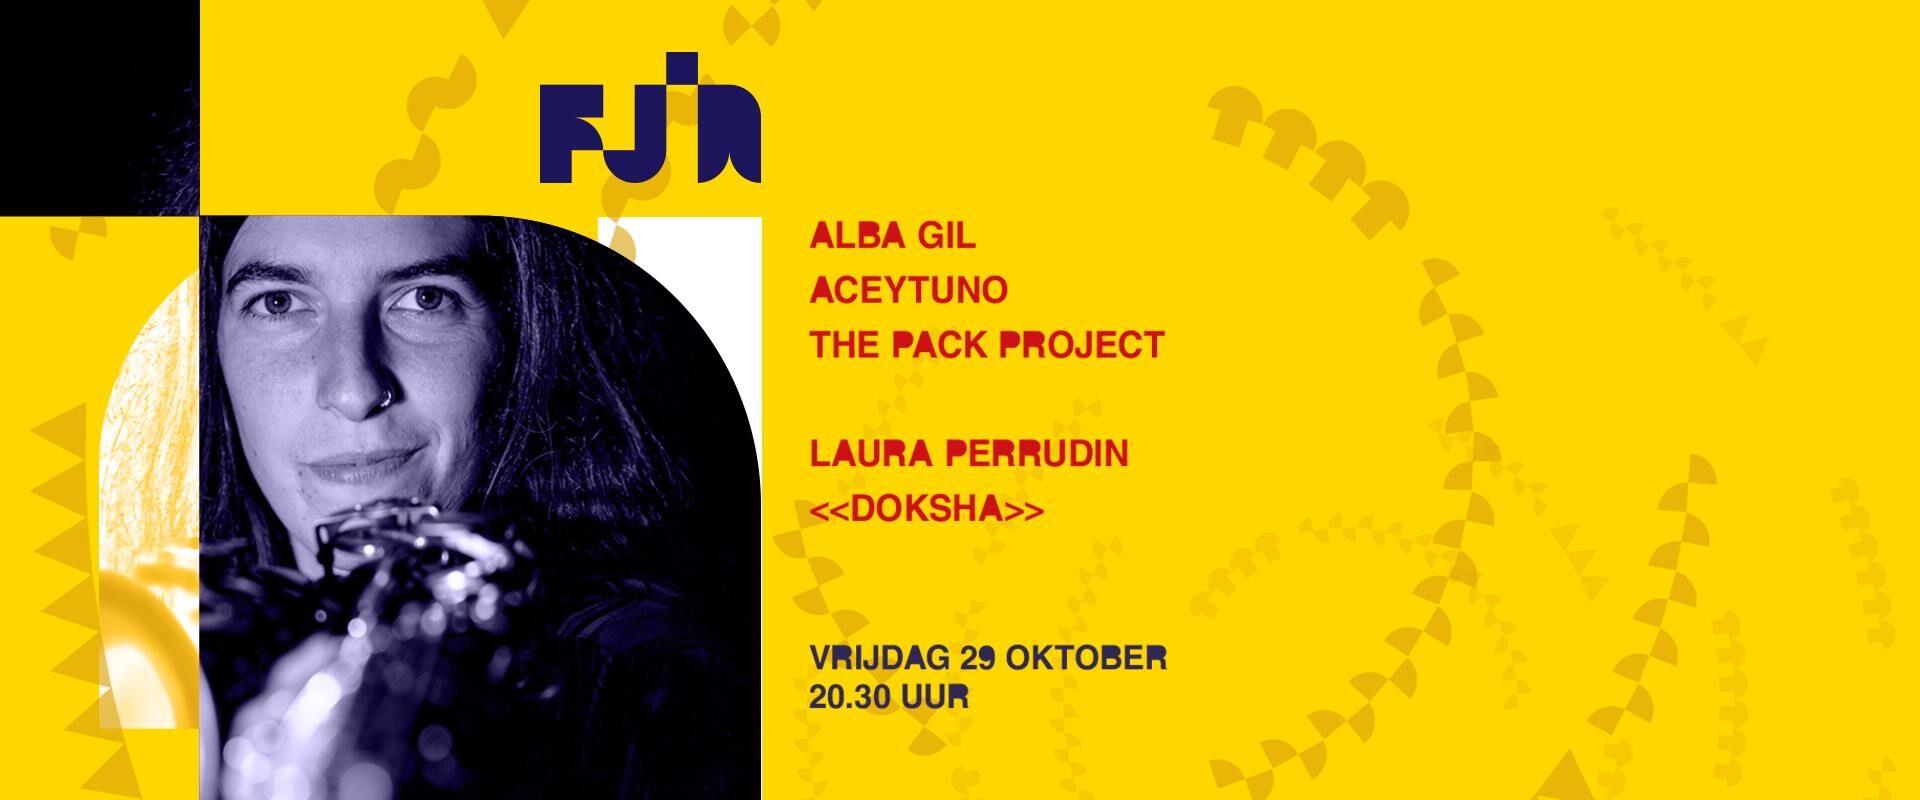 FJIN 2021 • Alba Gil Aceytuno • LAURA PERRUDIN <<Doksha>> 2